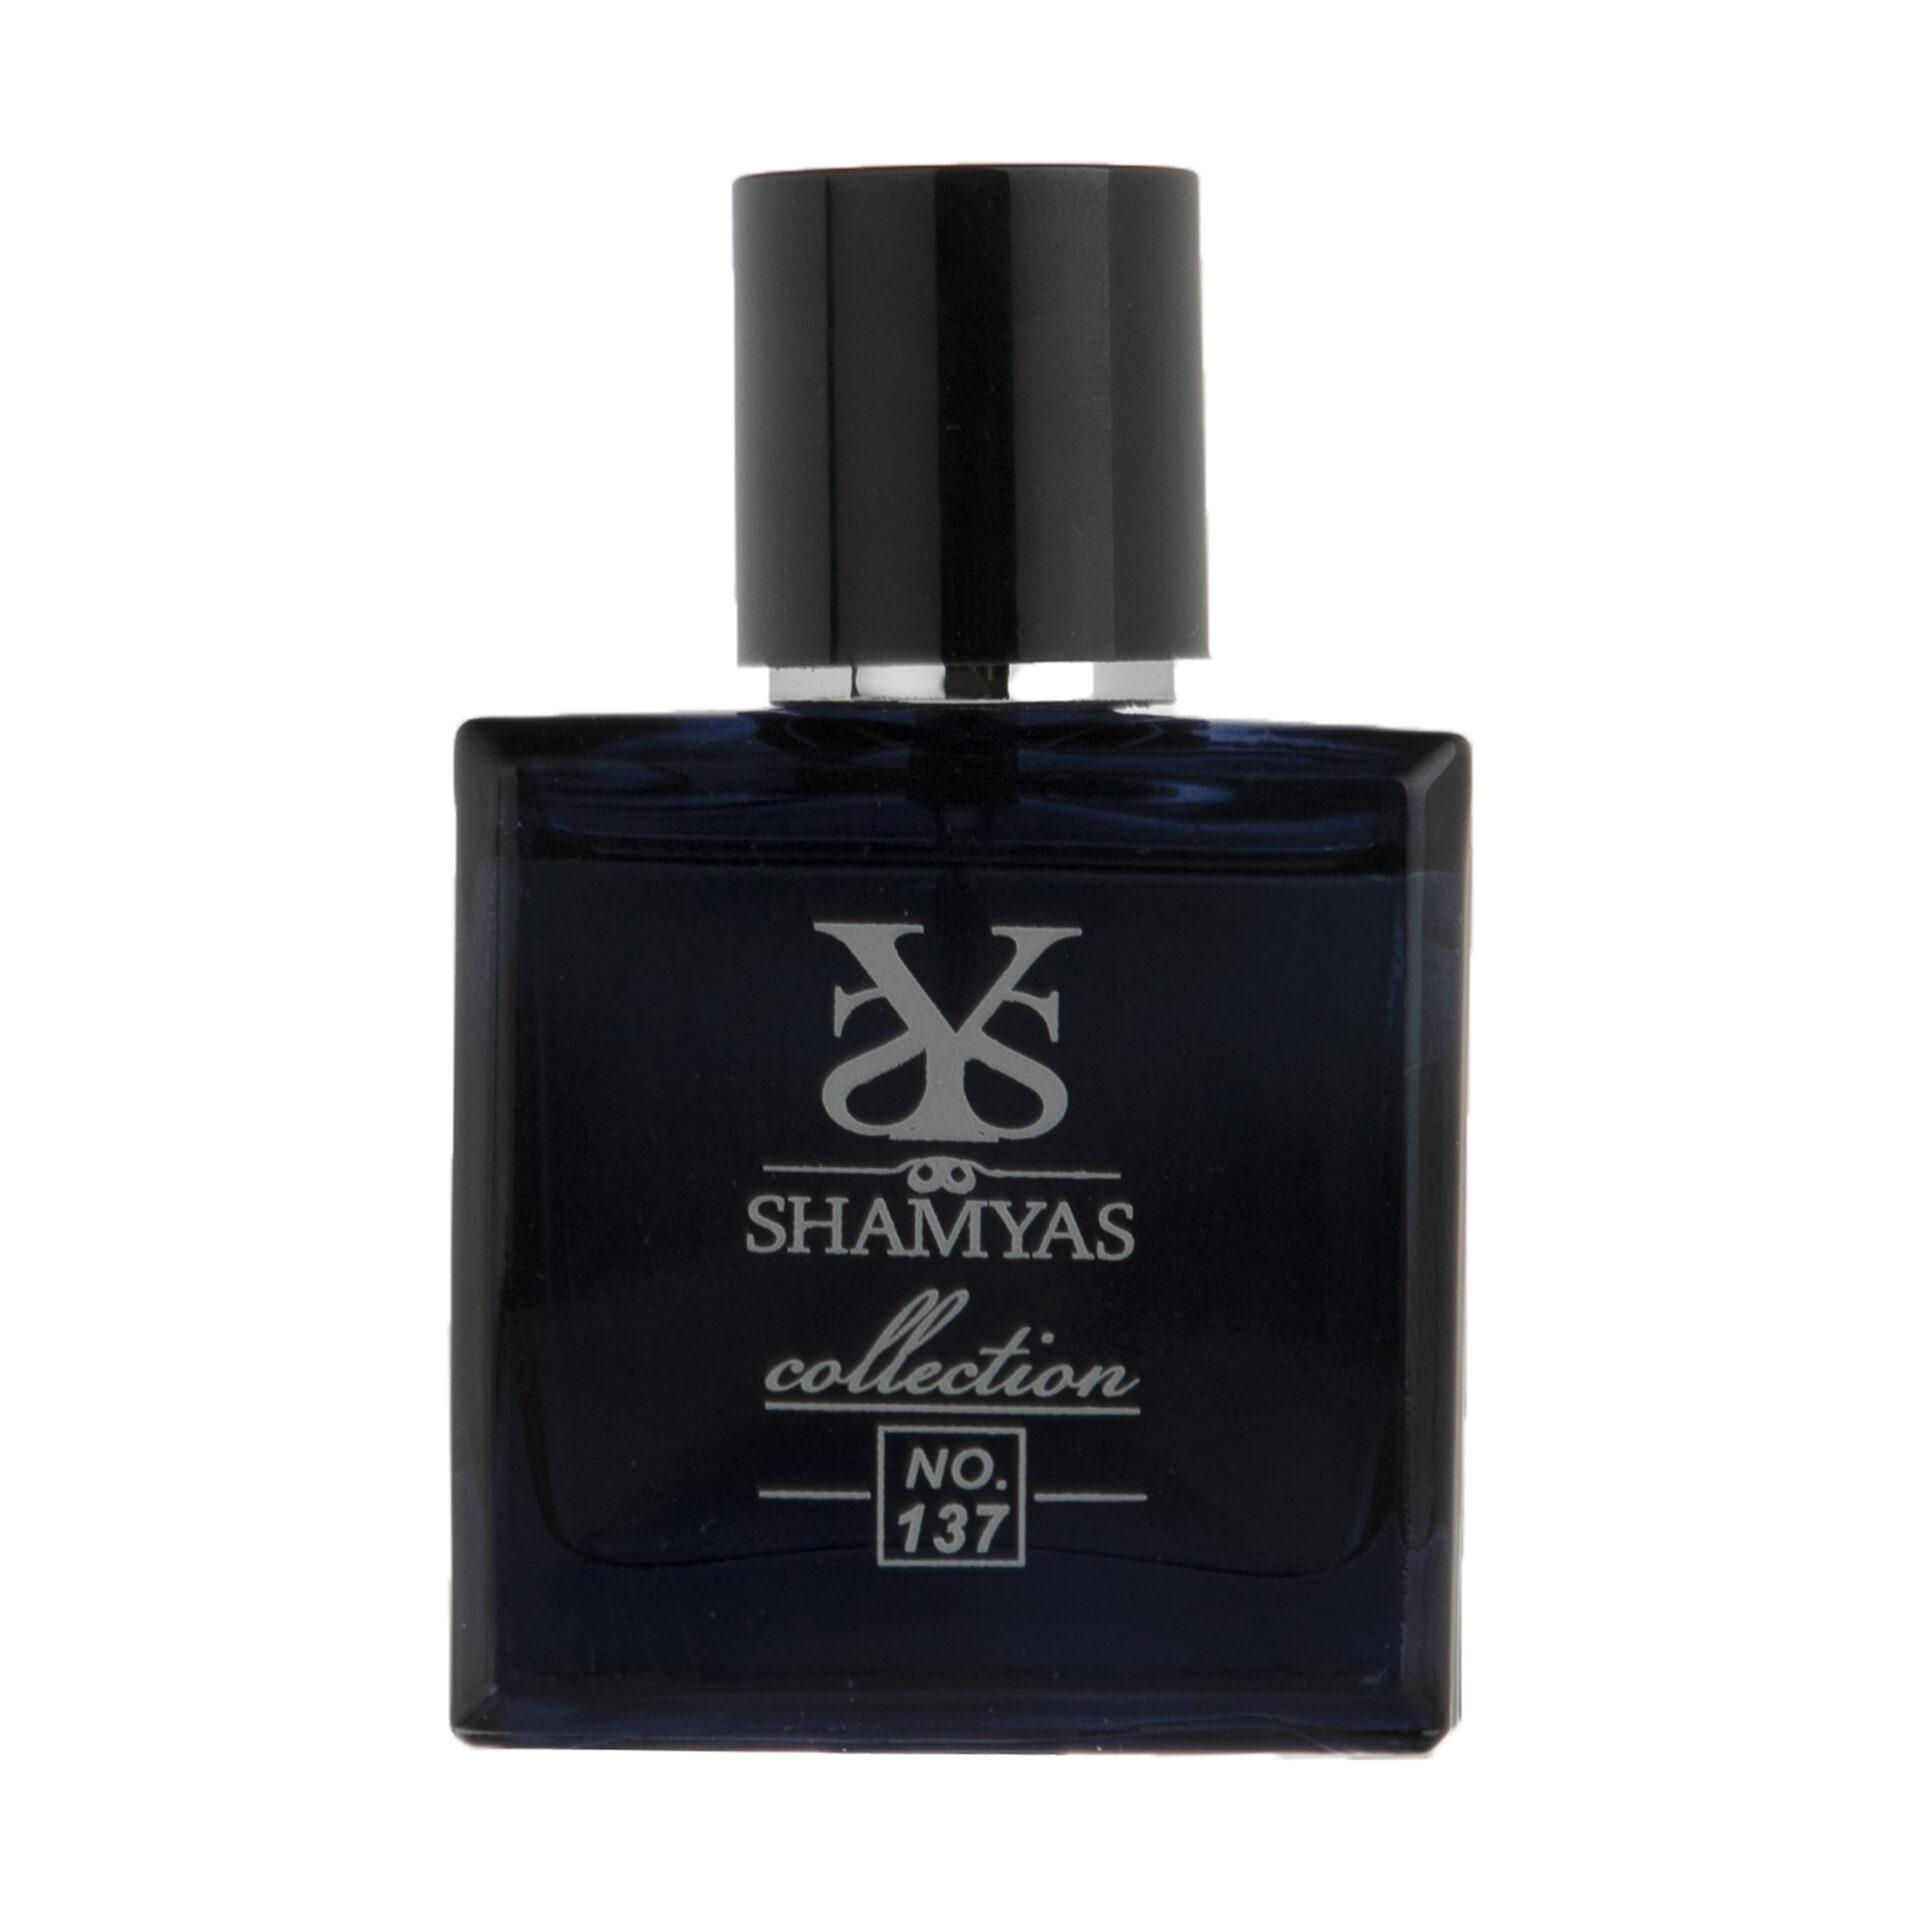 عطر جیبی مردانه شمیاس مدل Blue De Chanel حجم 30 میلی لیتر